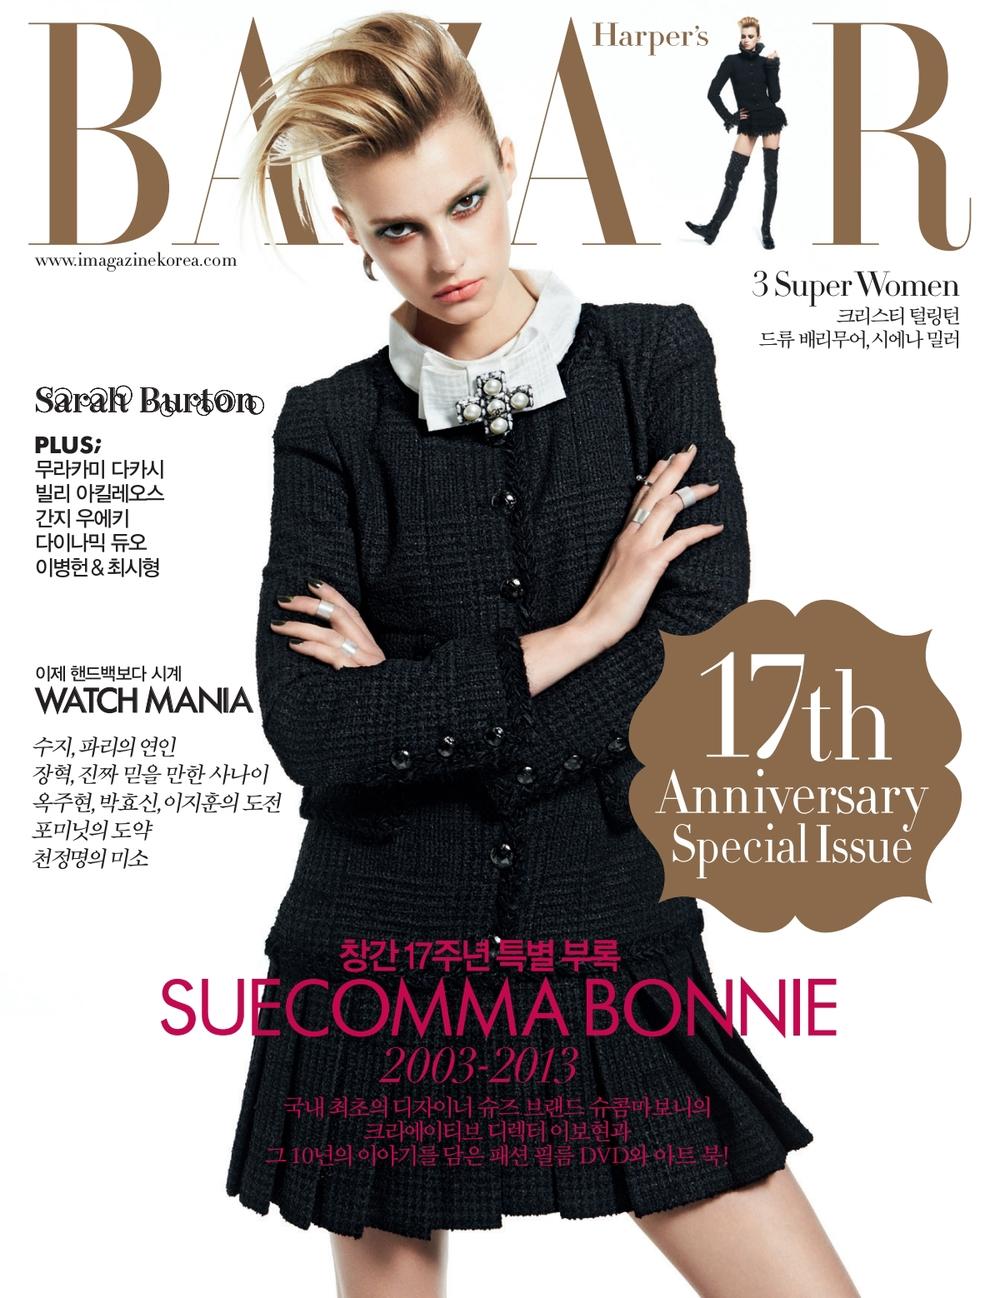 Harpers_Bazaar_Korea_Mark_Pillai_Aug_2013_01.jpg